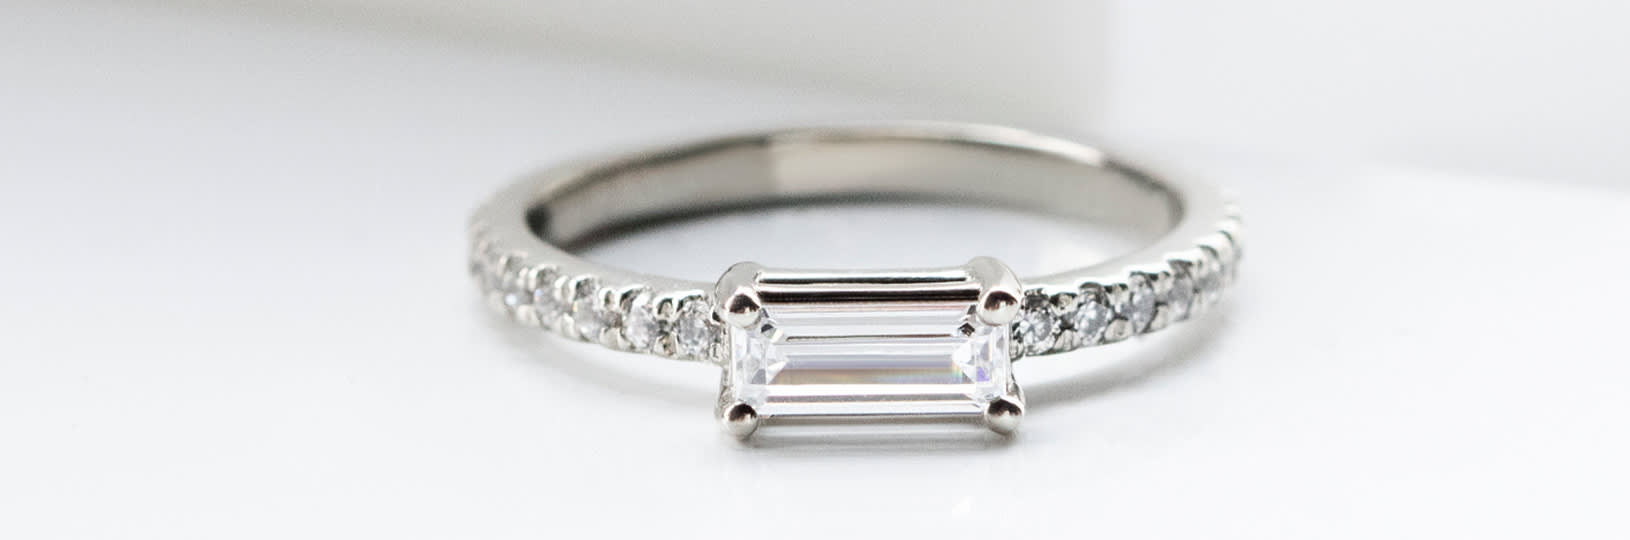 Simulated diamond promise ring.